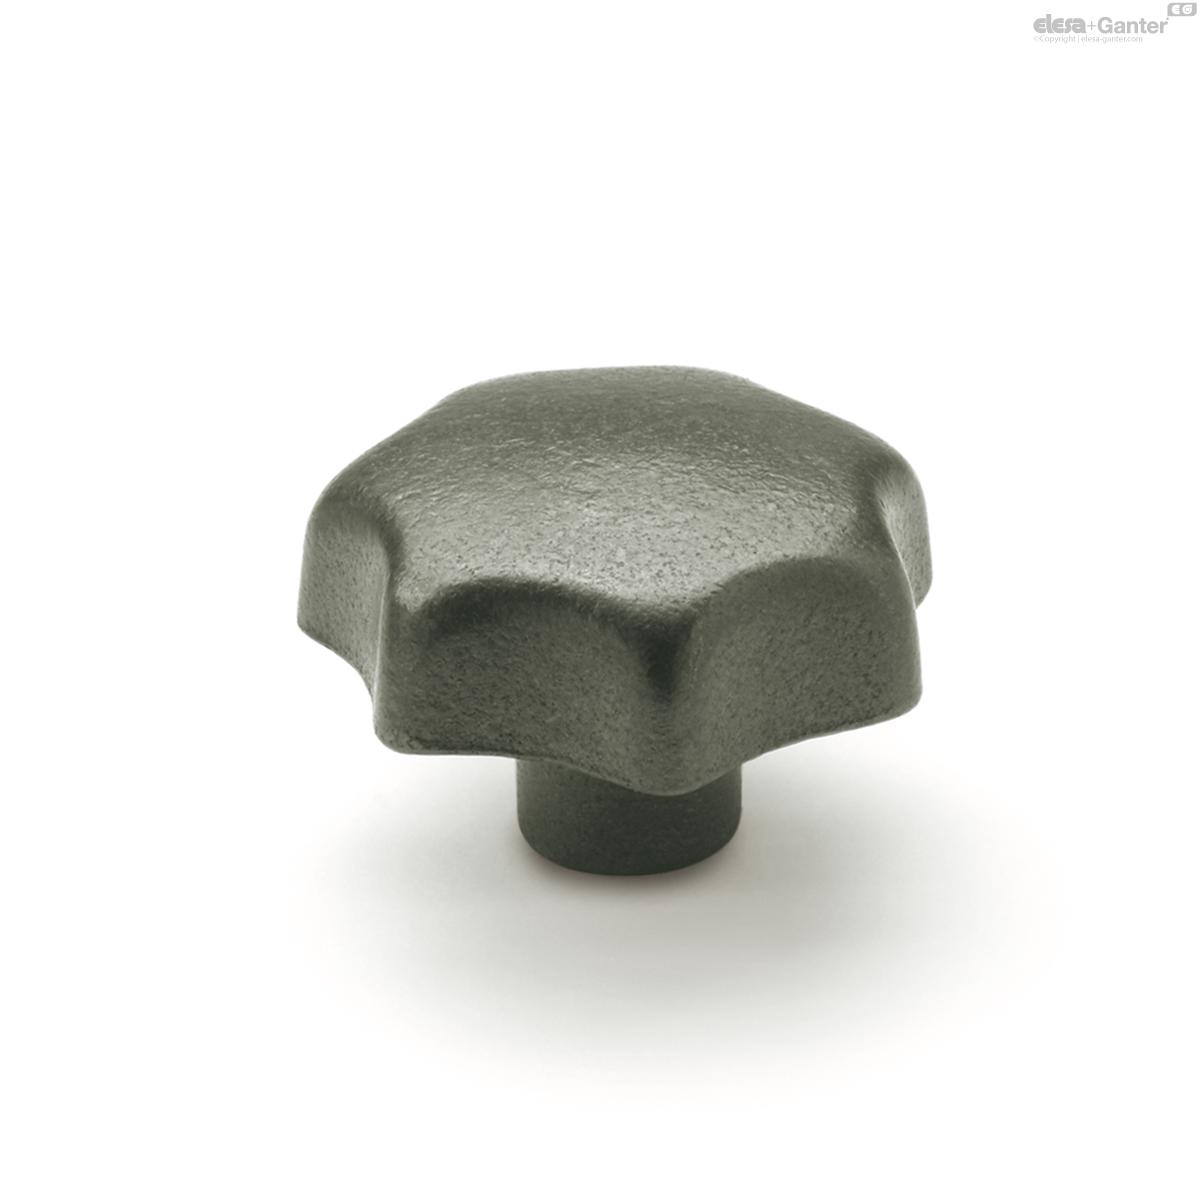 Ganter Din6336-Kt-63-M12-D Star Knob; Plastic; Thr/' Bore